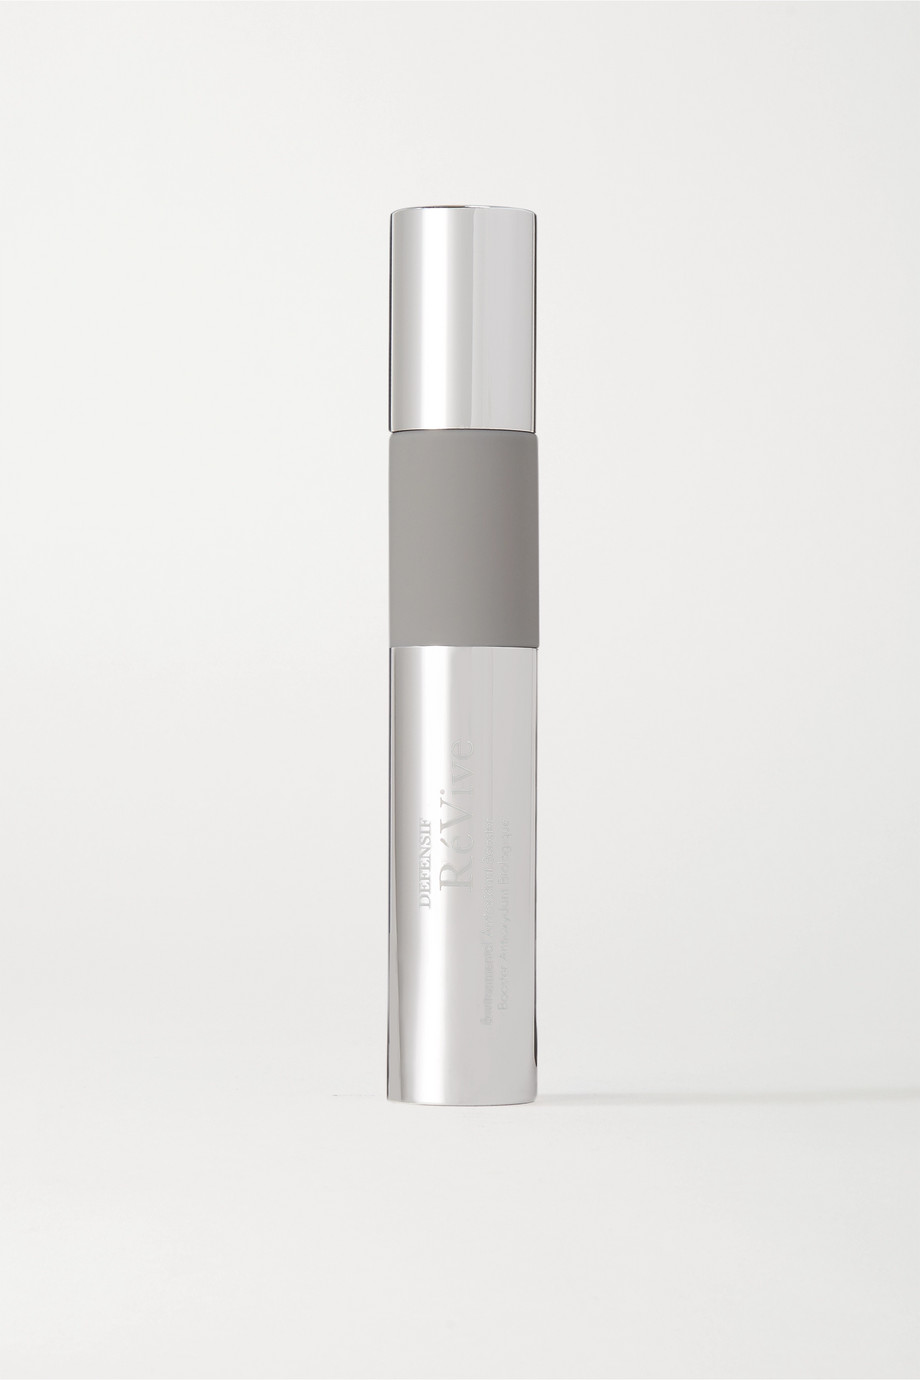 RéVive Booster antioxydant biologique Defensif, 30 ml